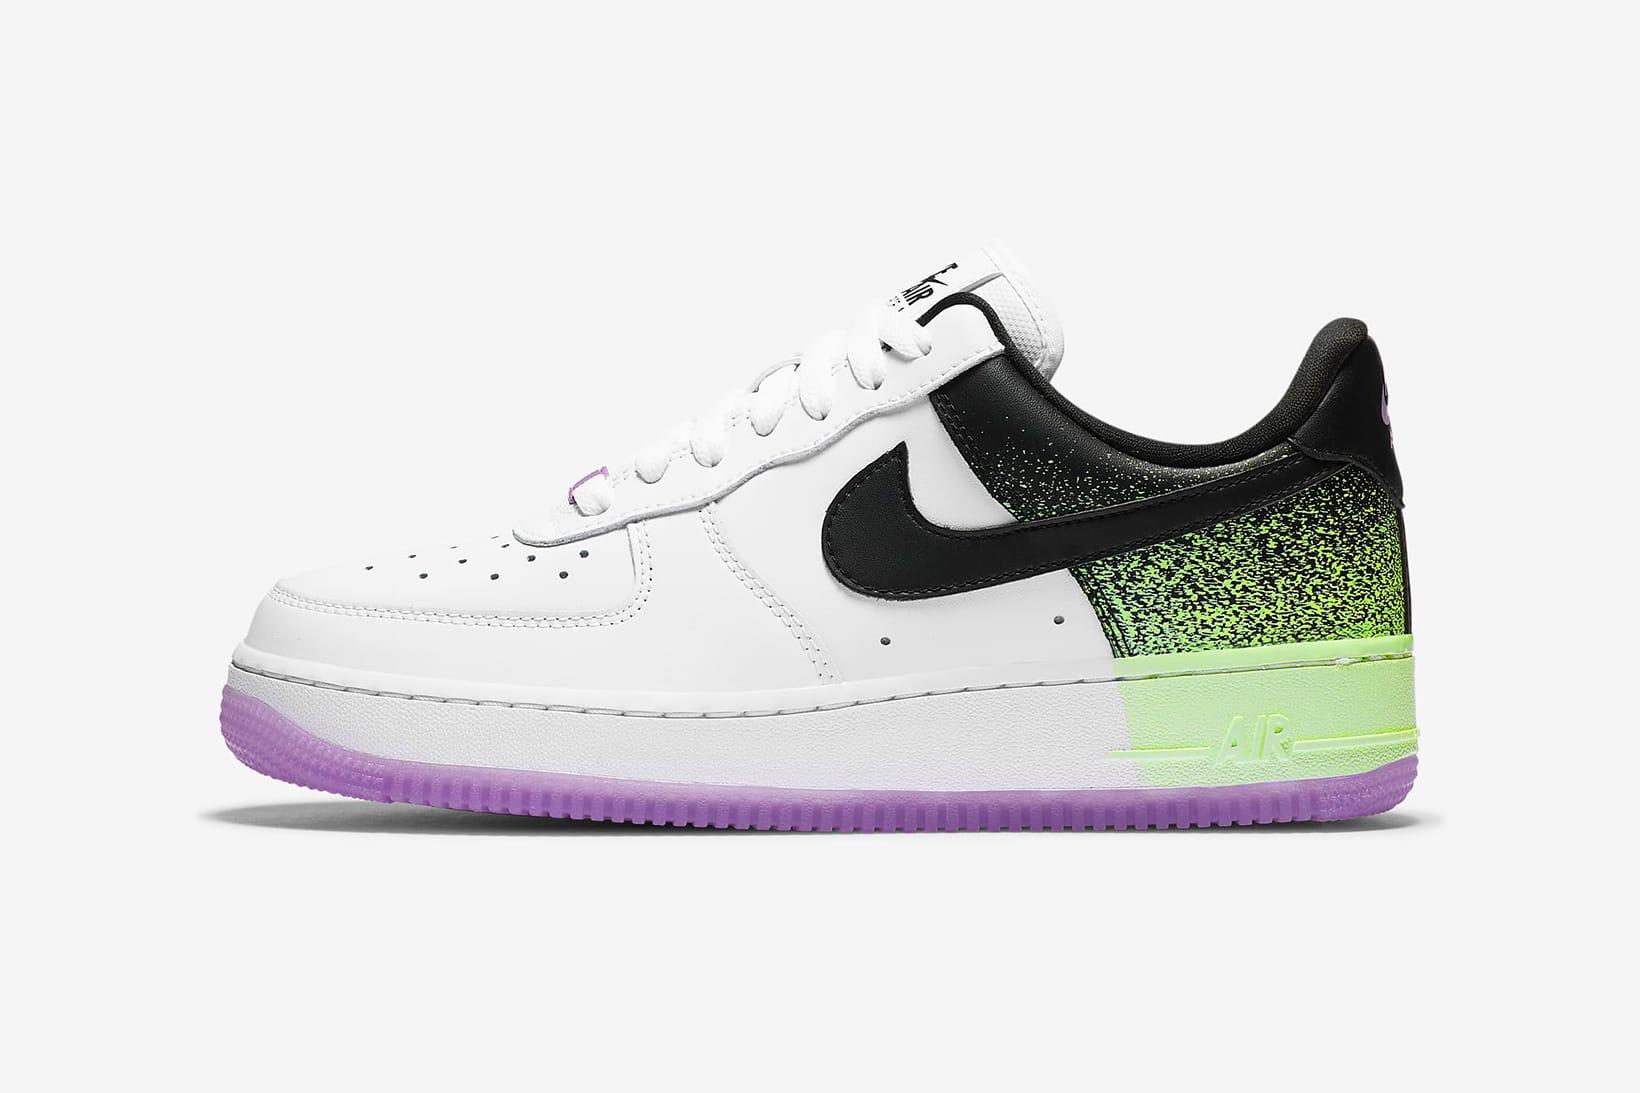 Air Force 1 '07 Neon Green/Purple